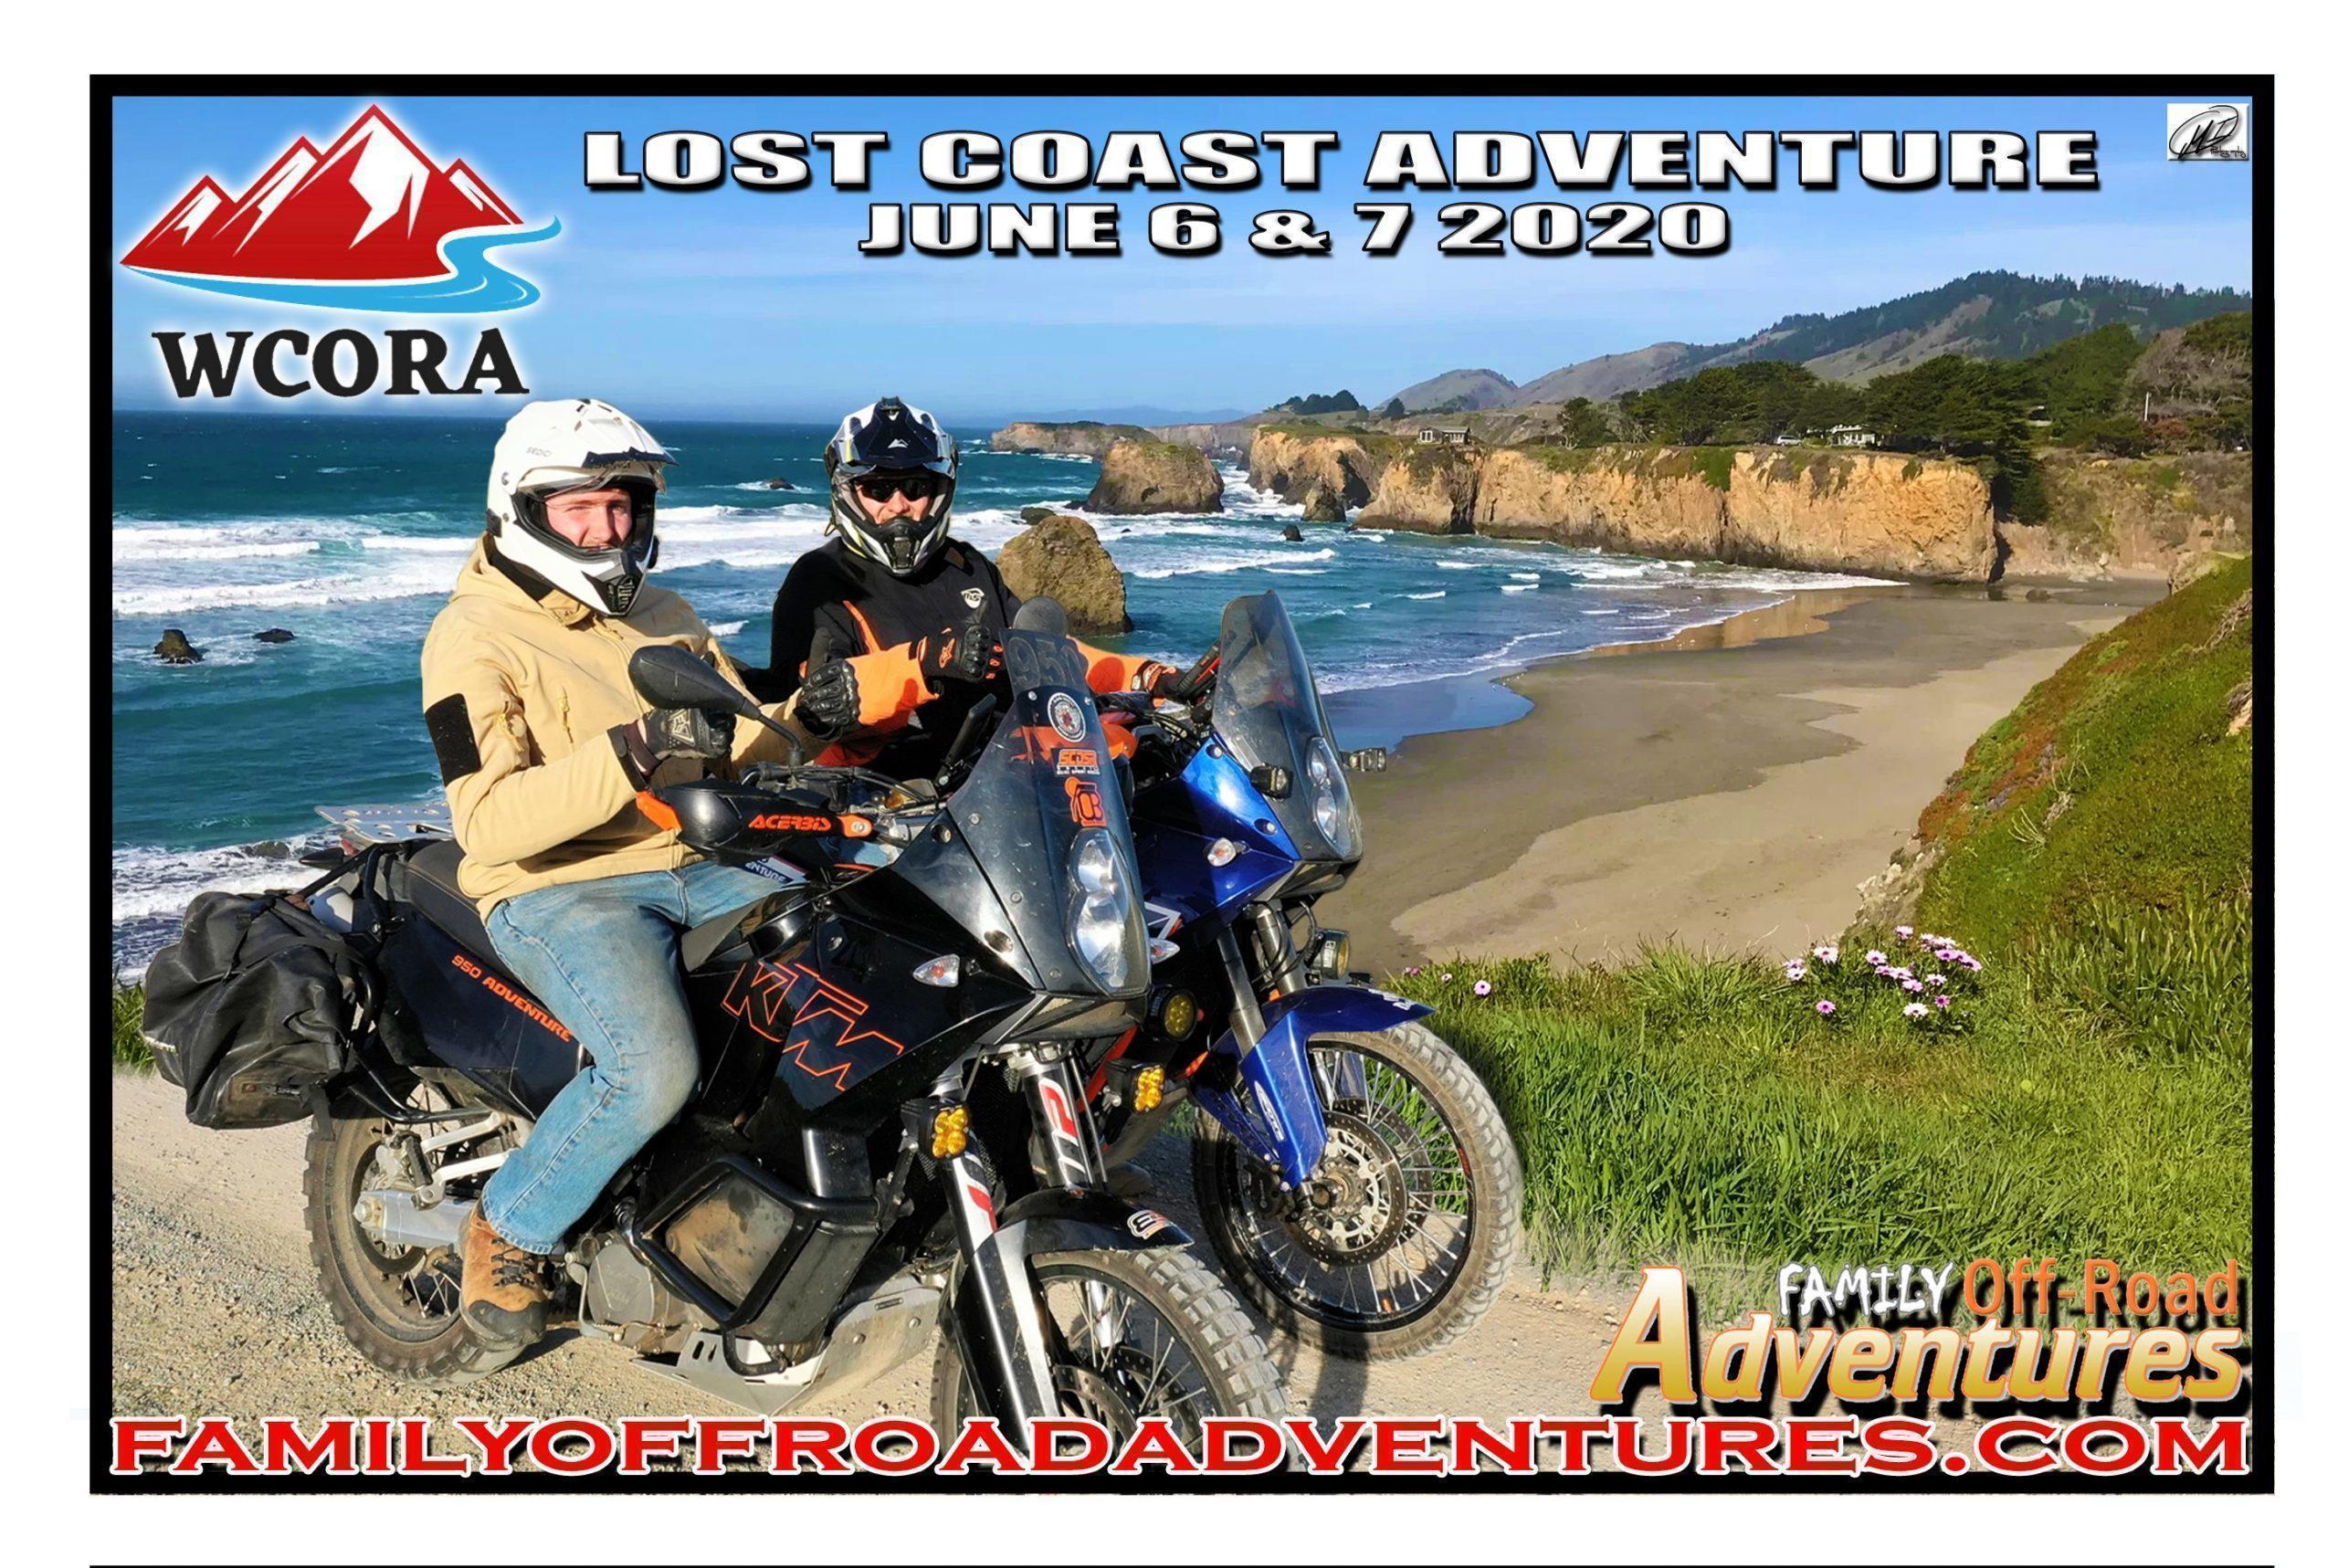 Lost Coast Adventure - Web